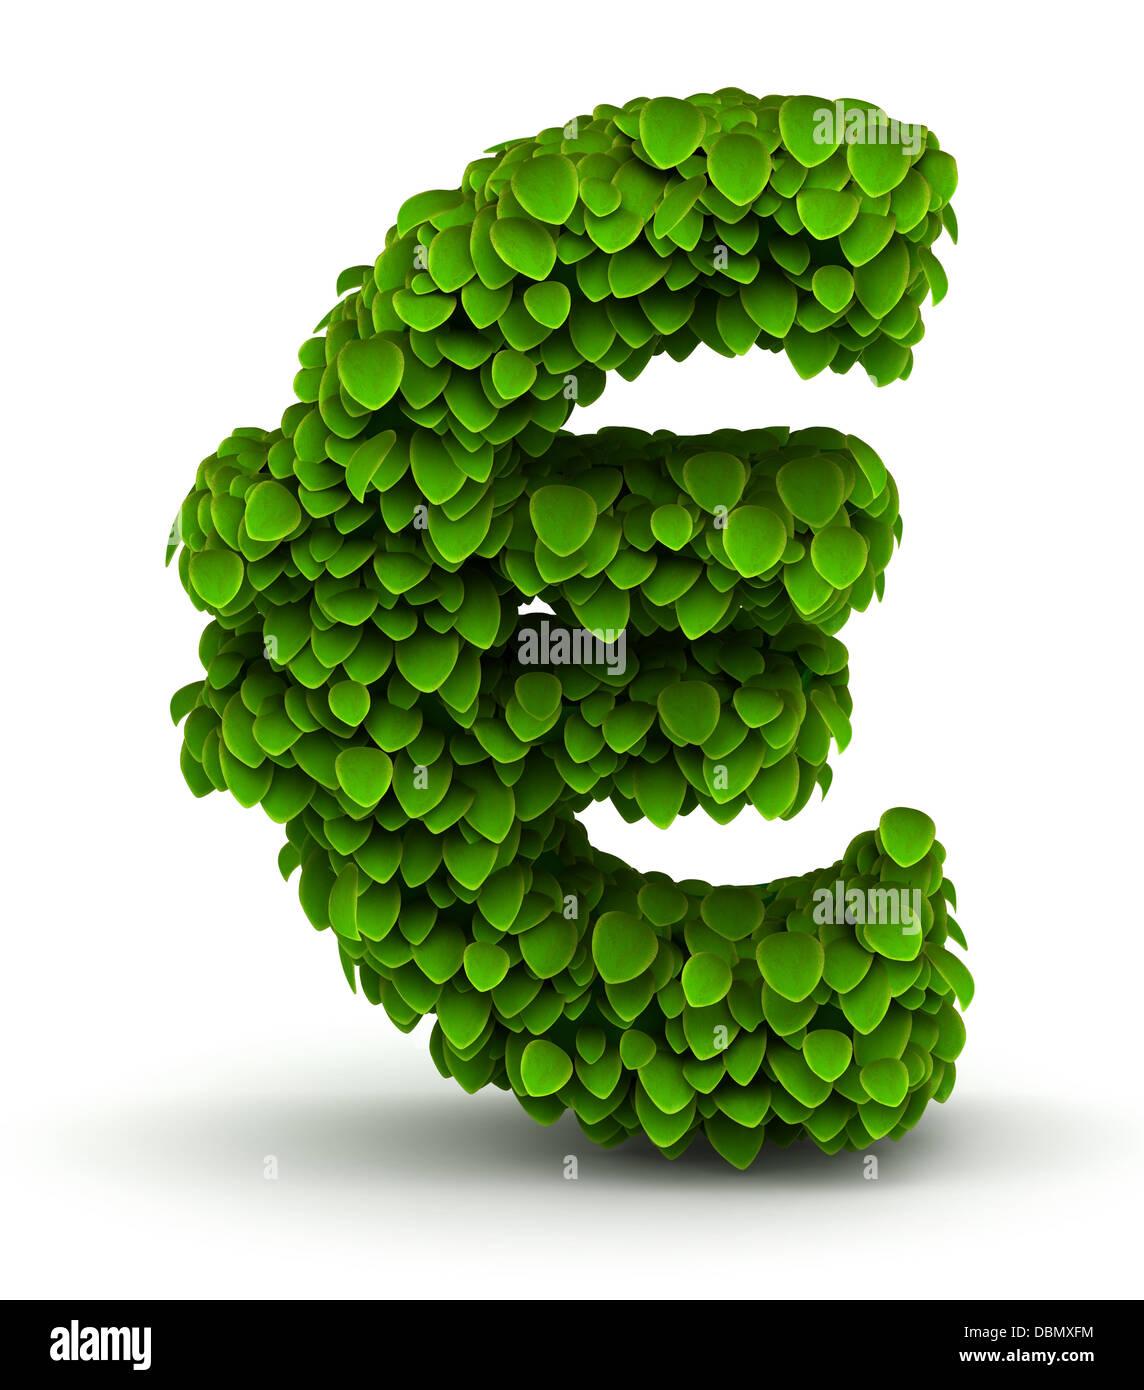 Euro symbol green leaves font stock photo 58852184 alamy euro symbol green leaves font biocorpaavc Gallery